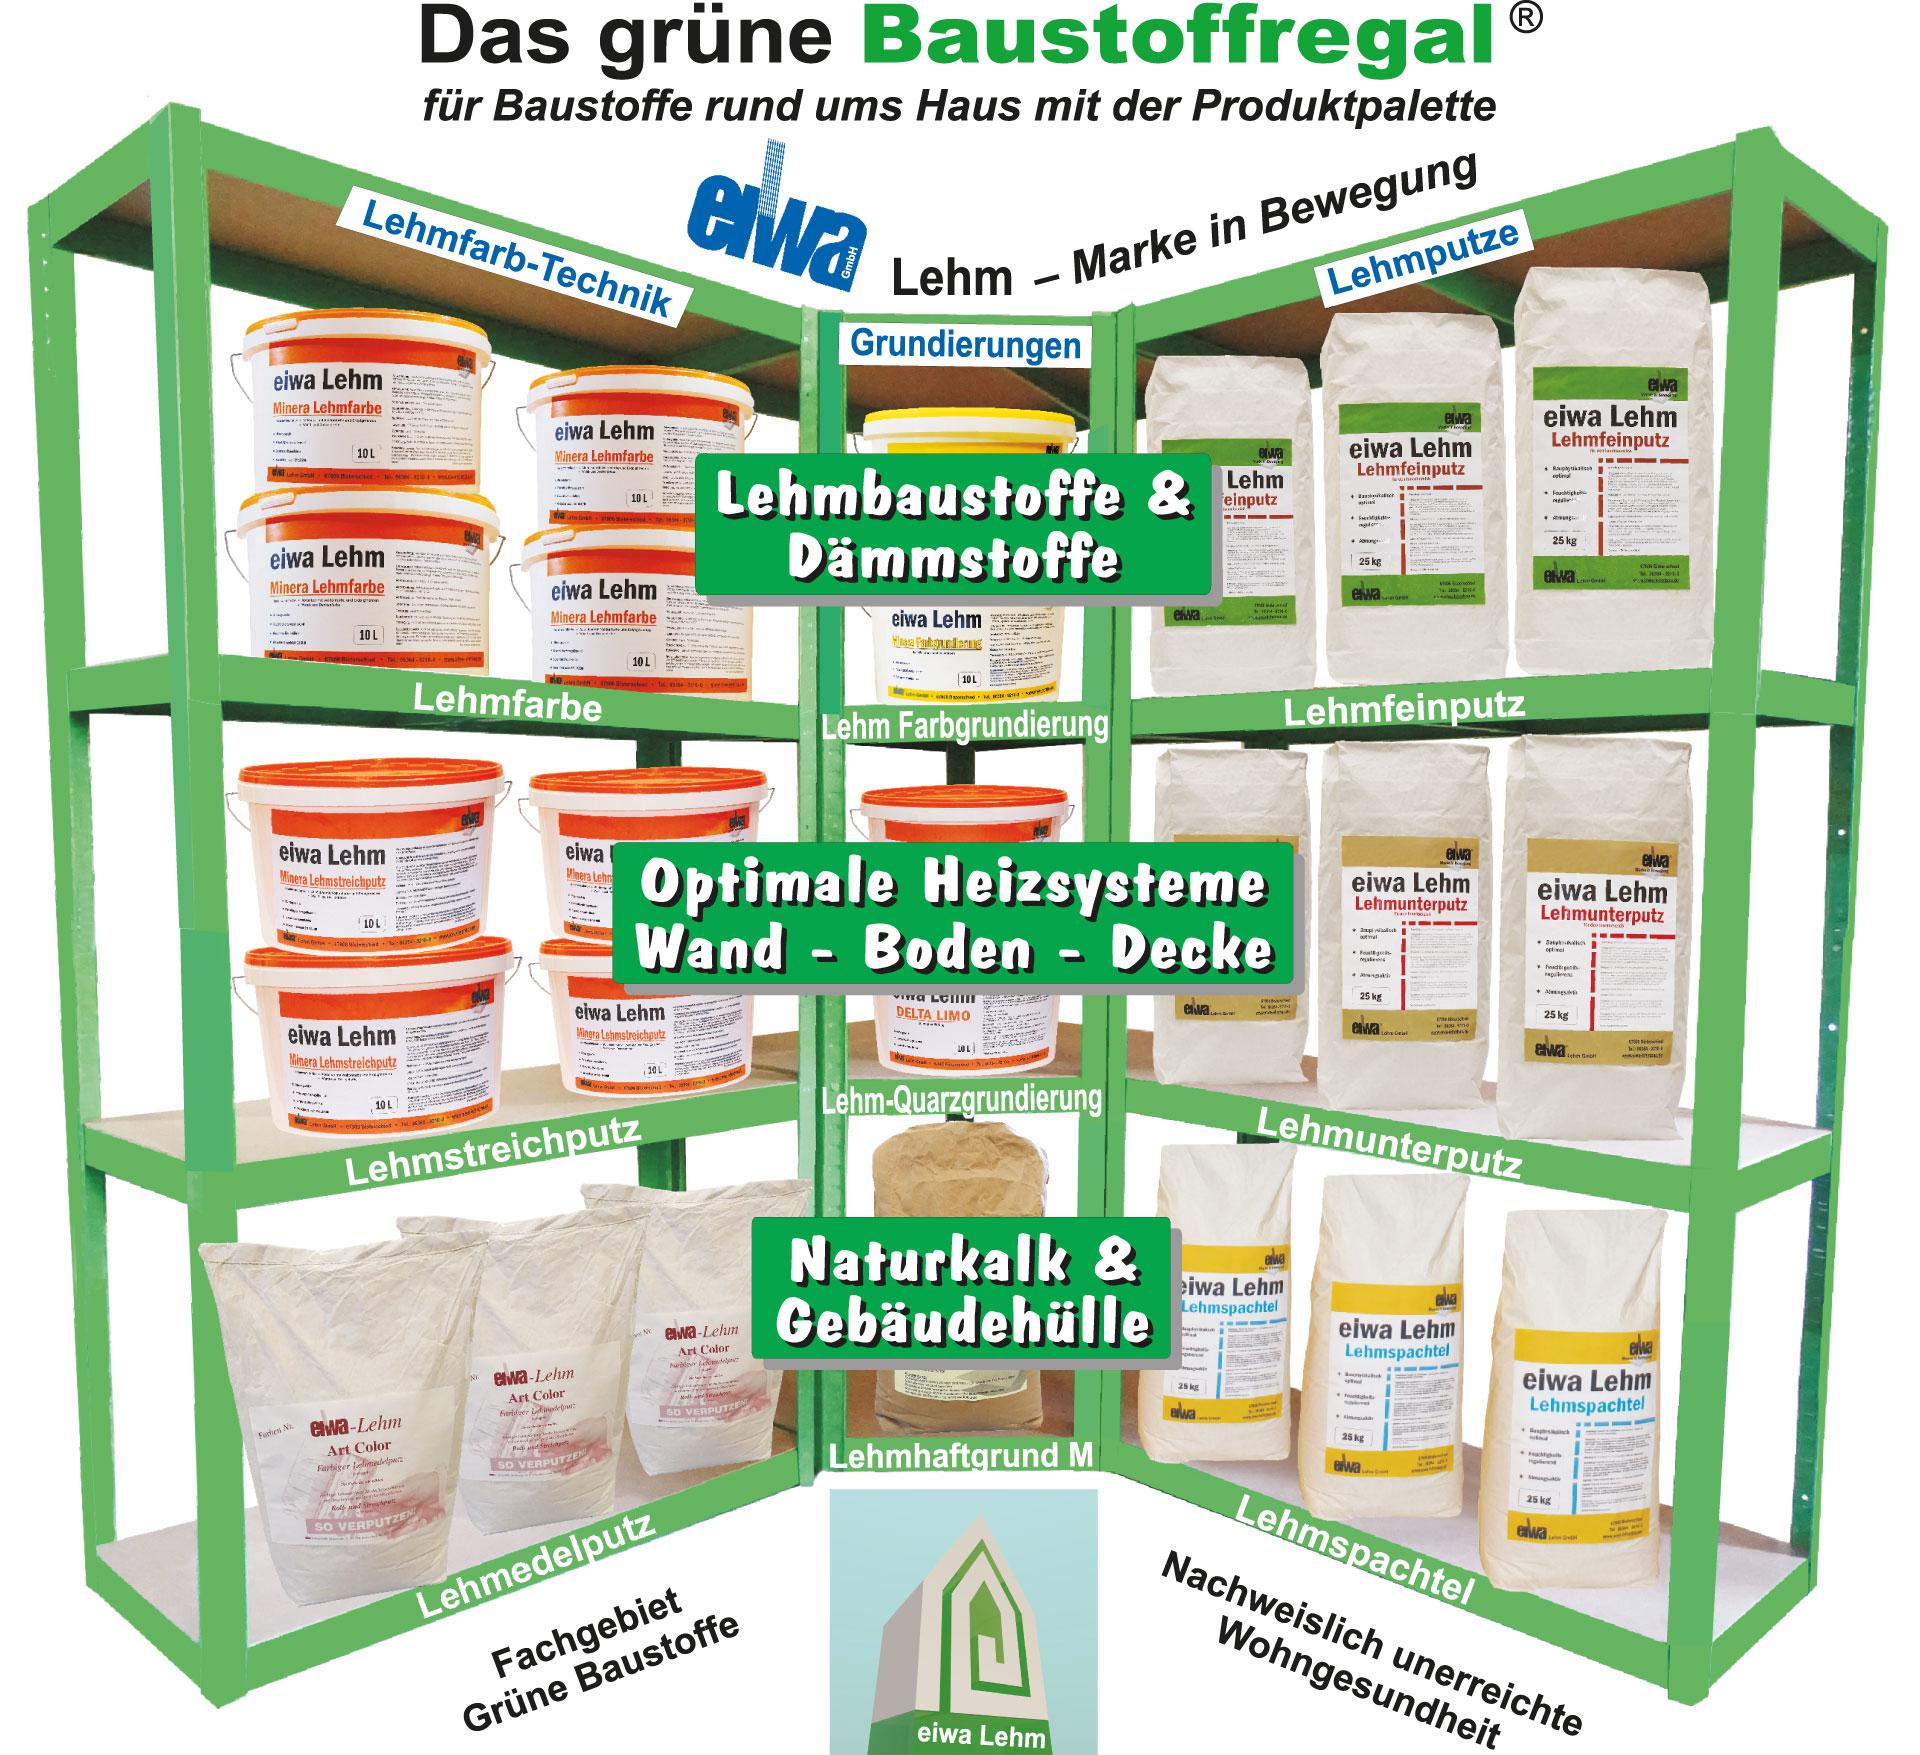 Das-grüne-Baustoffregal-Produktpalette